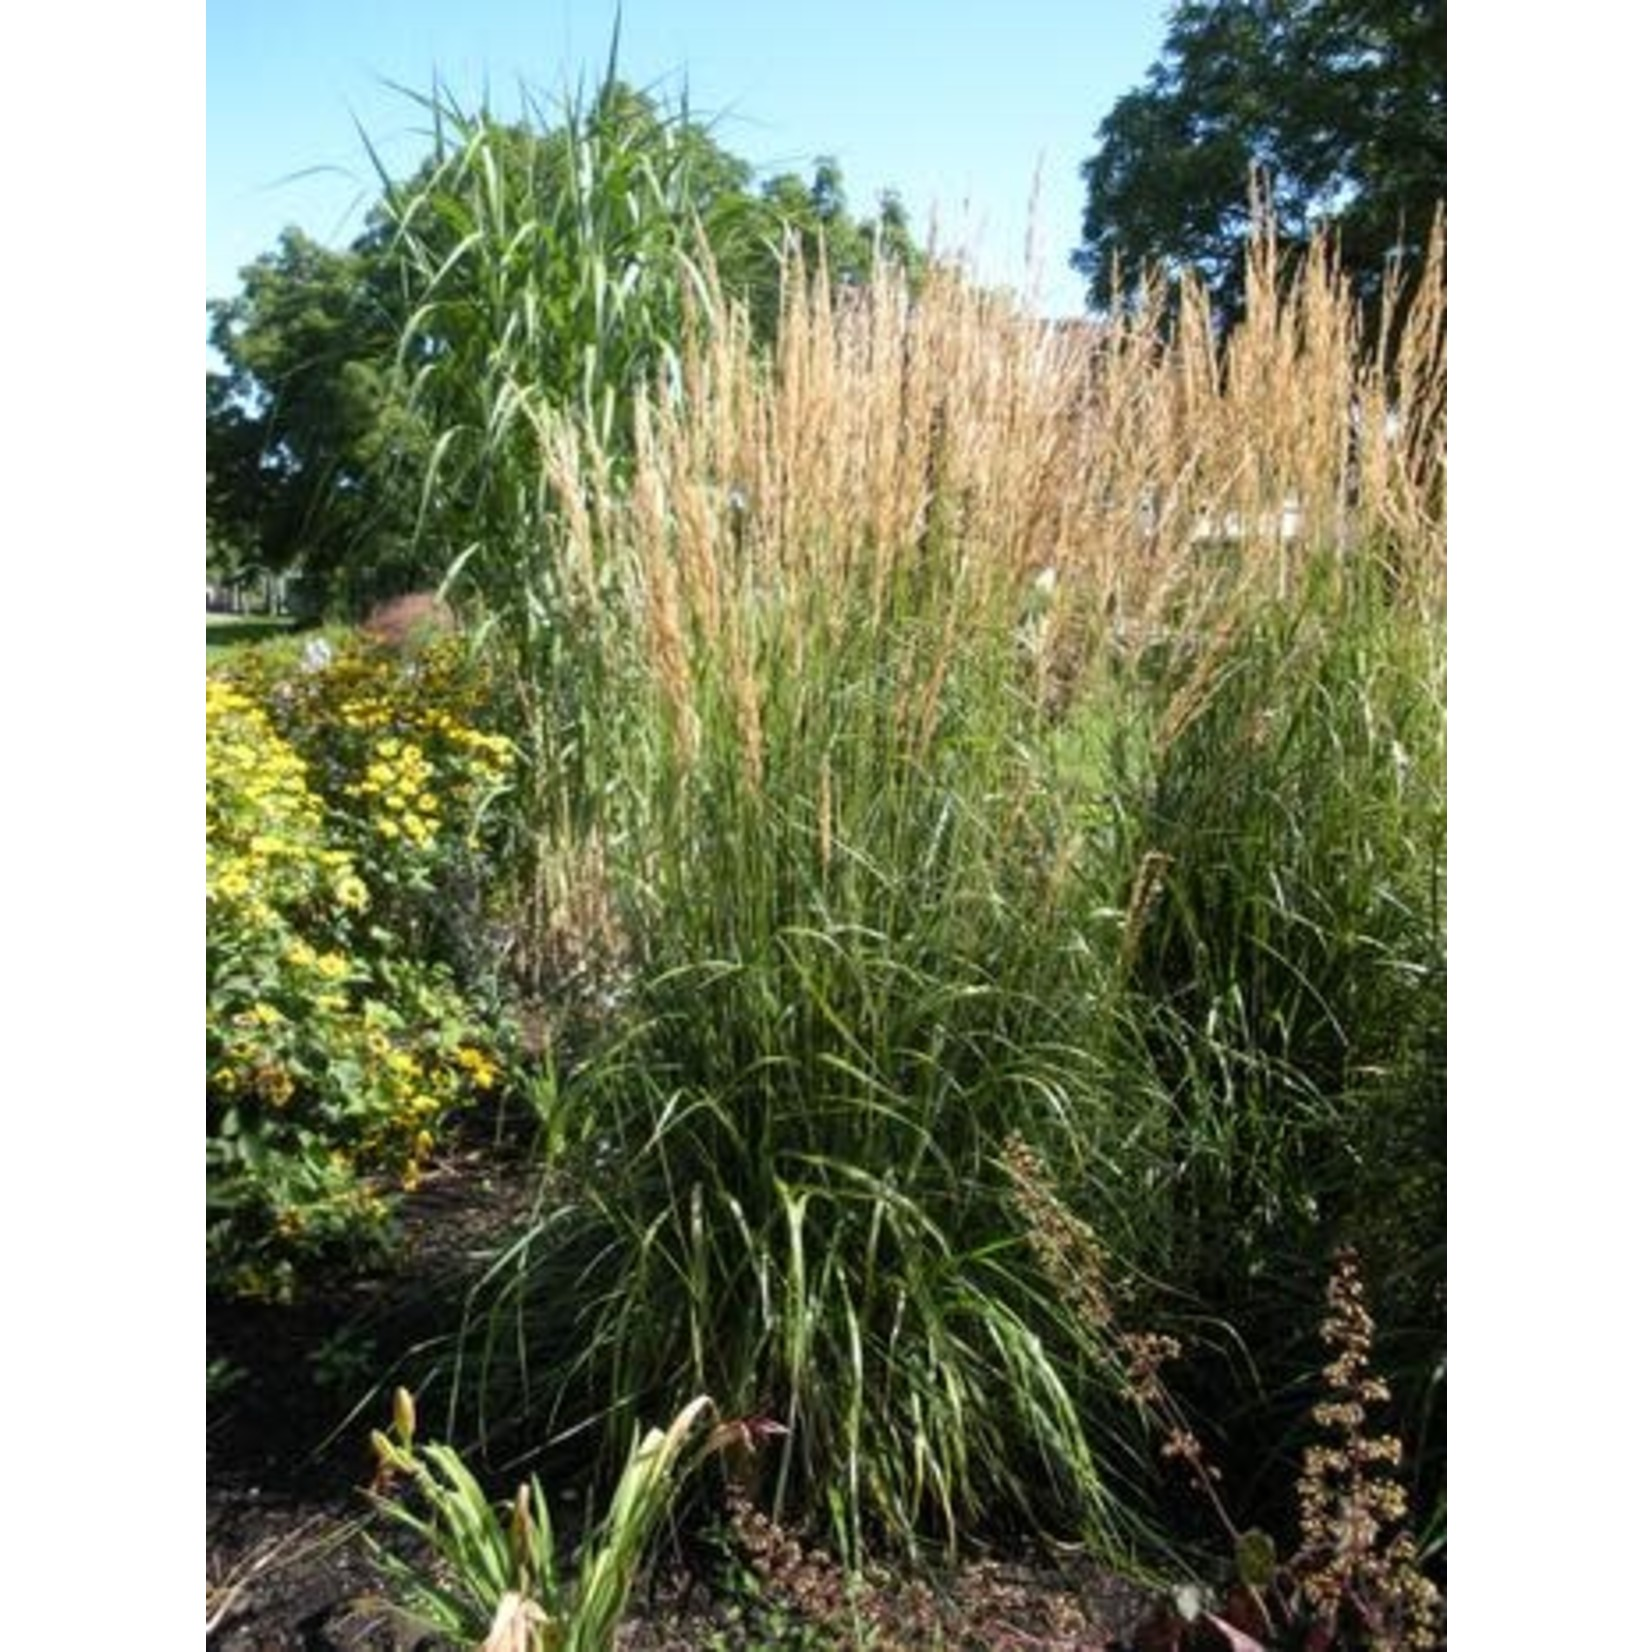 Feather Reed Grass - calamagrostis 'Karl Foerster' 1 gal